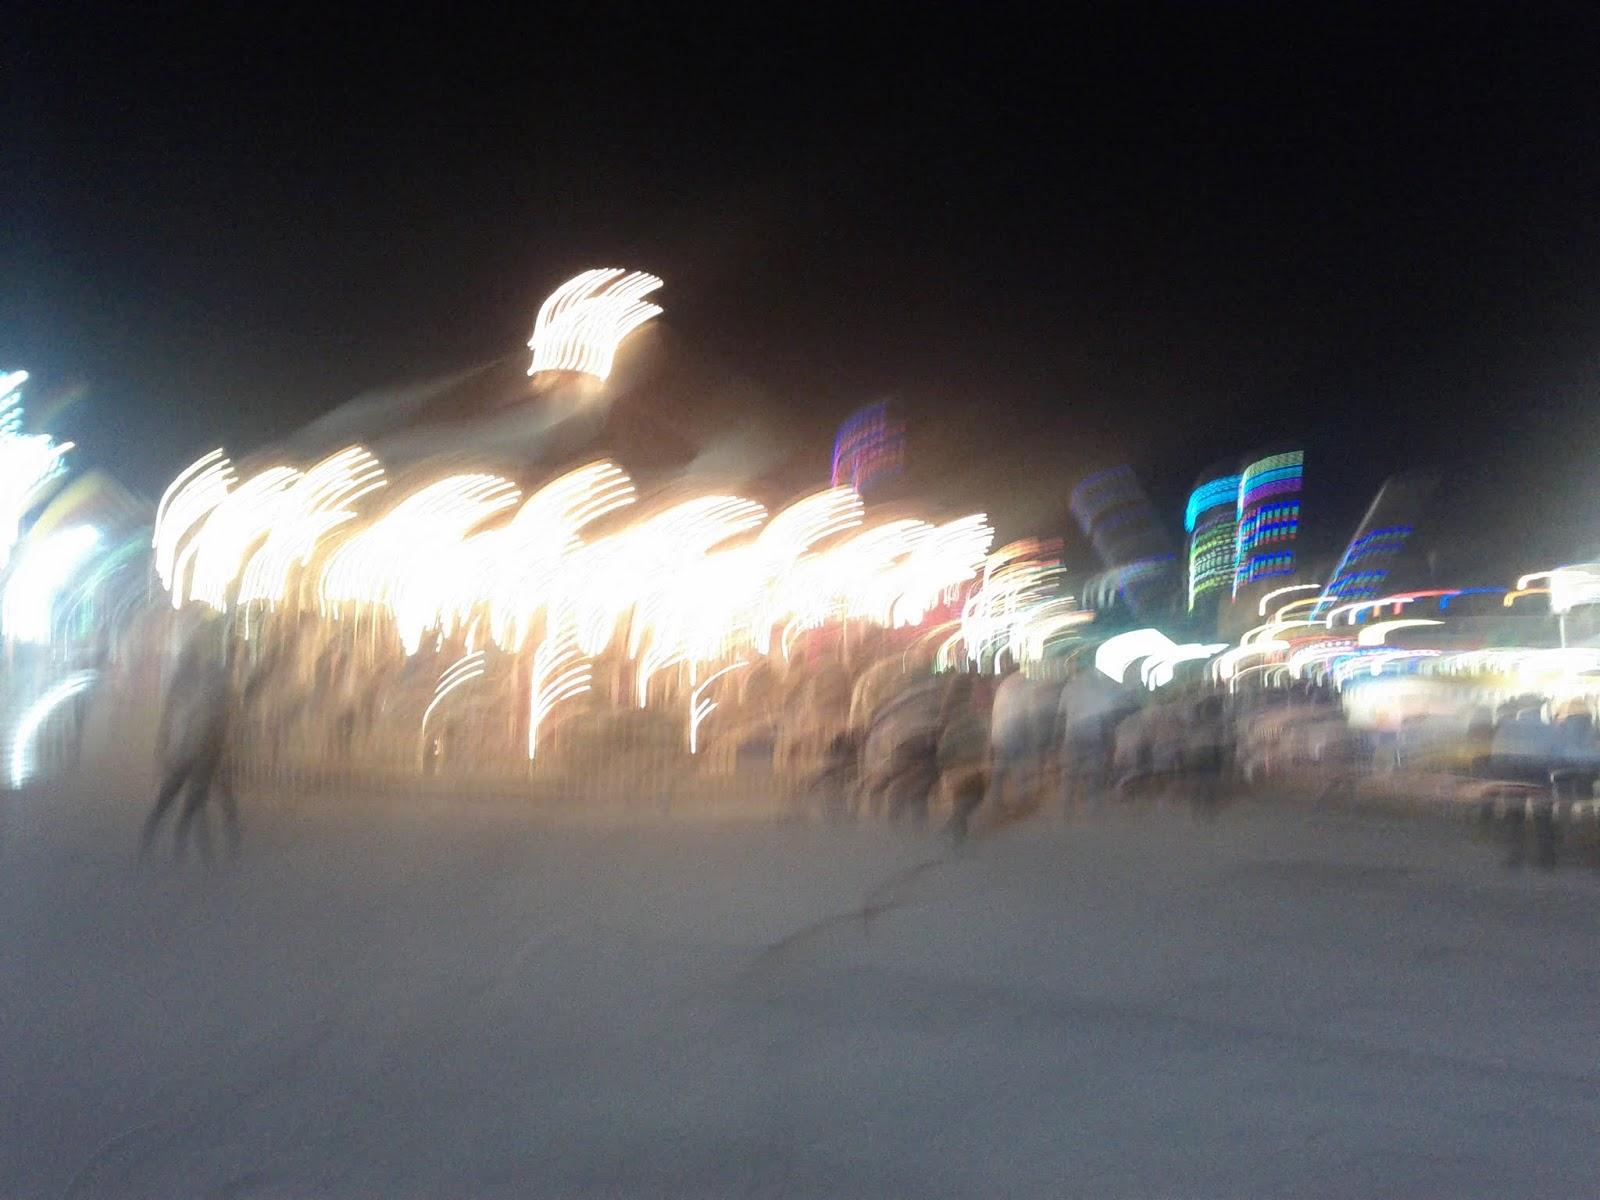 Fort Bend County Fair 2012 - IMG_20121006_193907.jpg